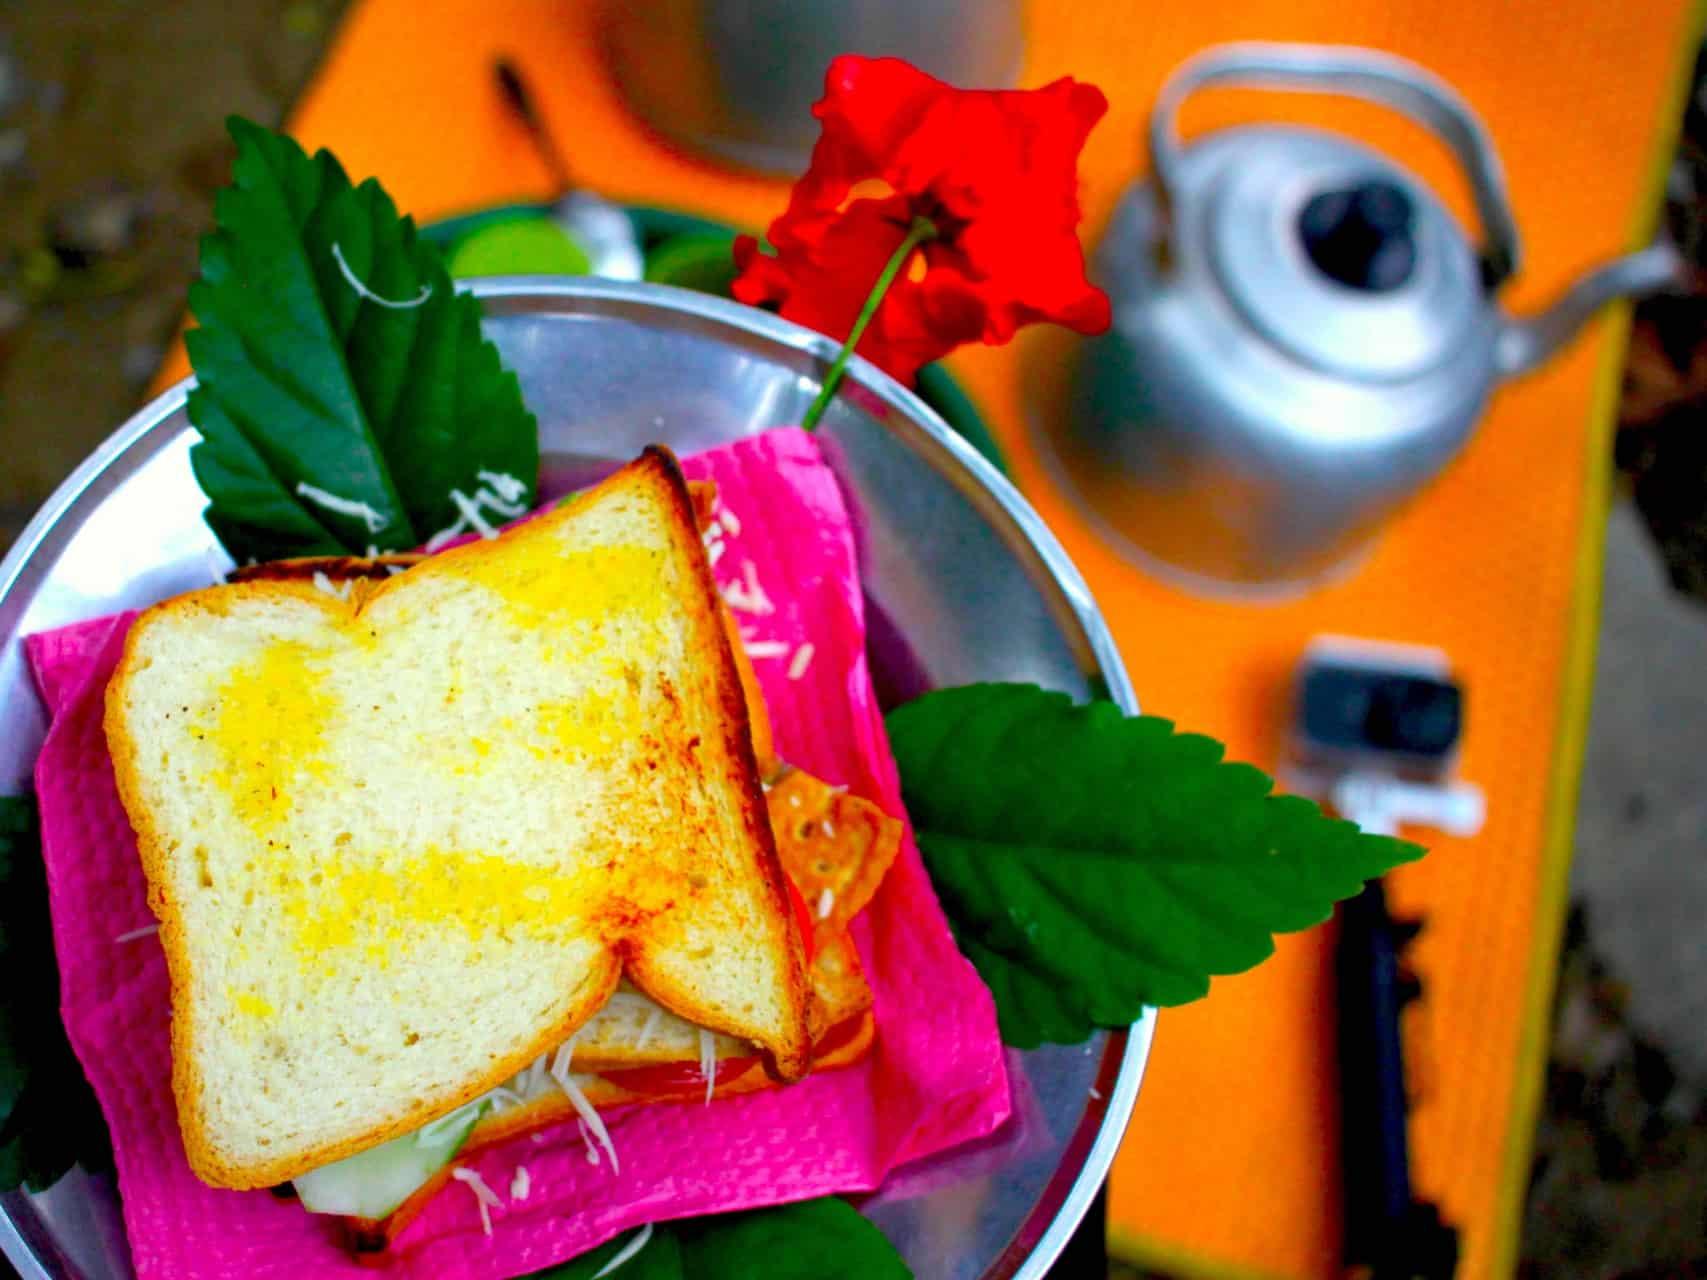 JUNGLE SANDWICH - ORANGUTAN TREKKING - 3-DAY TREK BY SUMATRA ECOTRAVEL